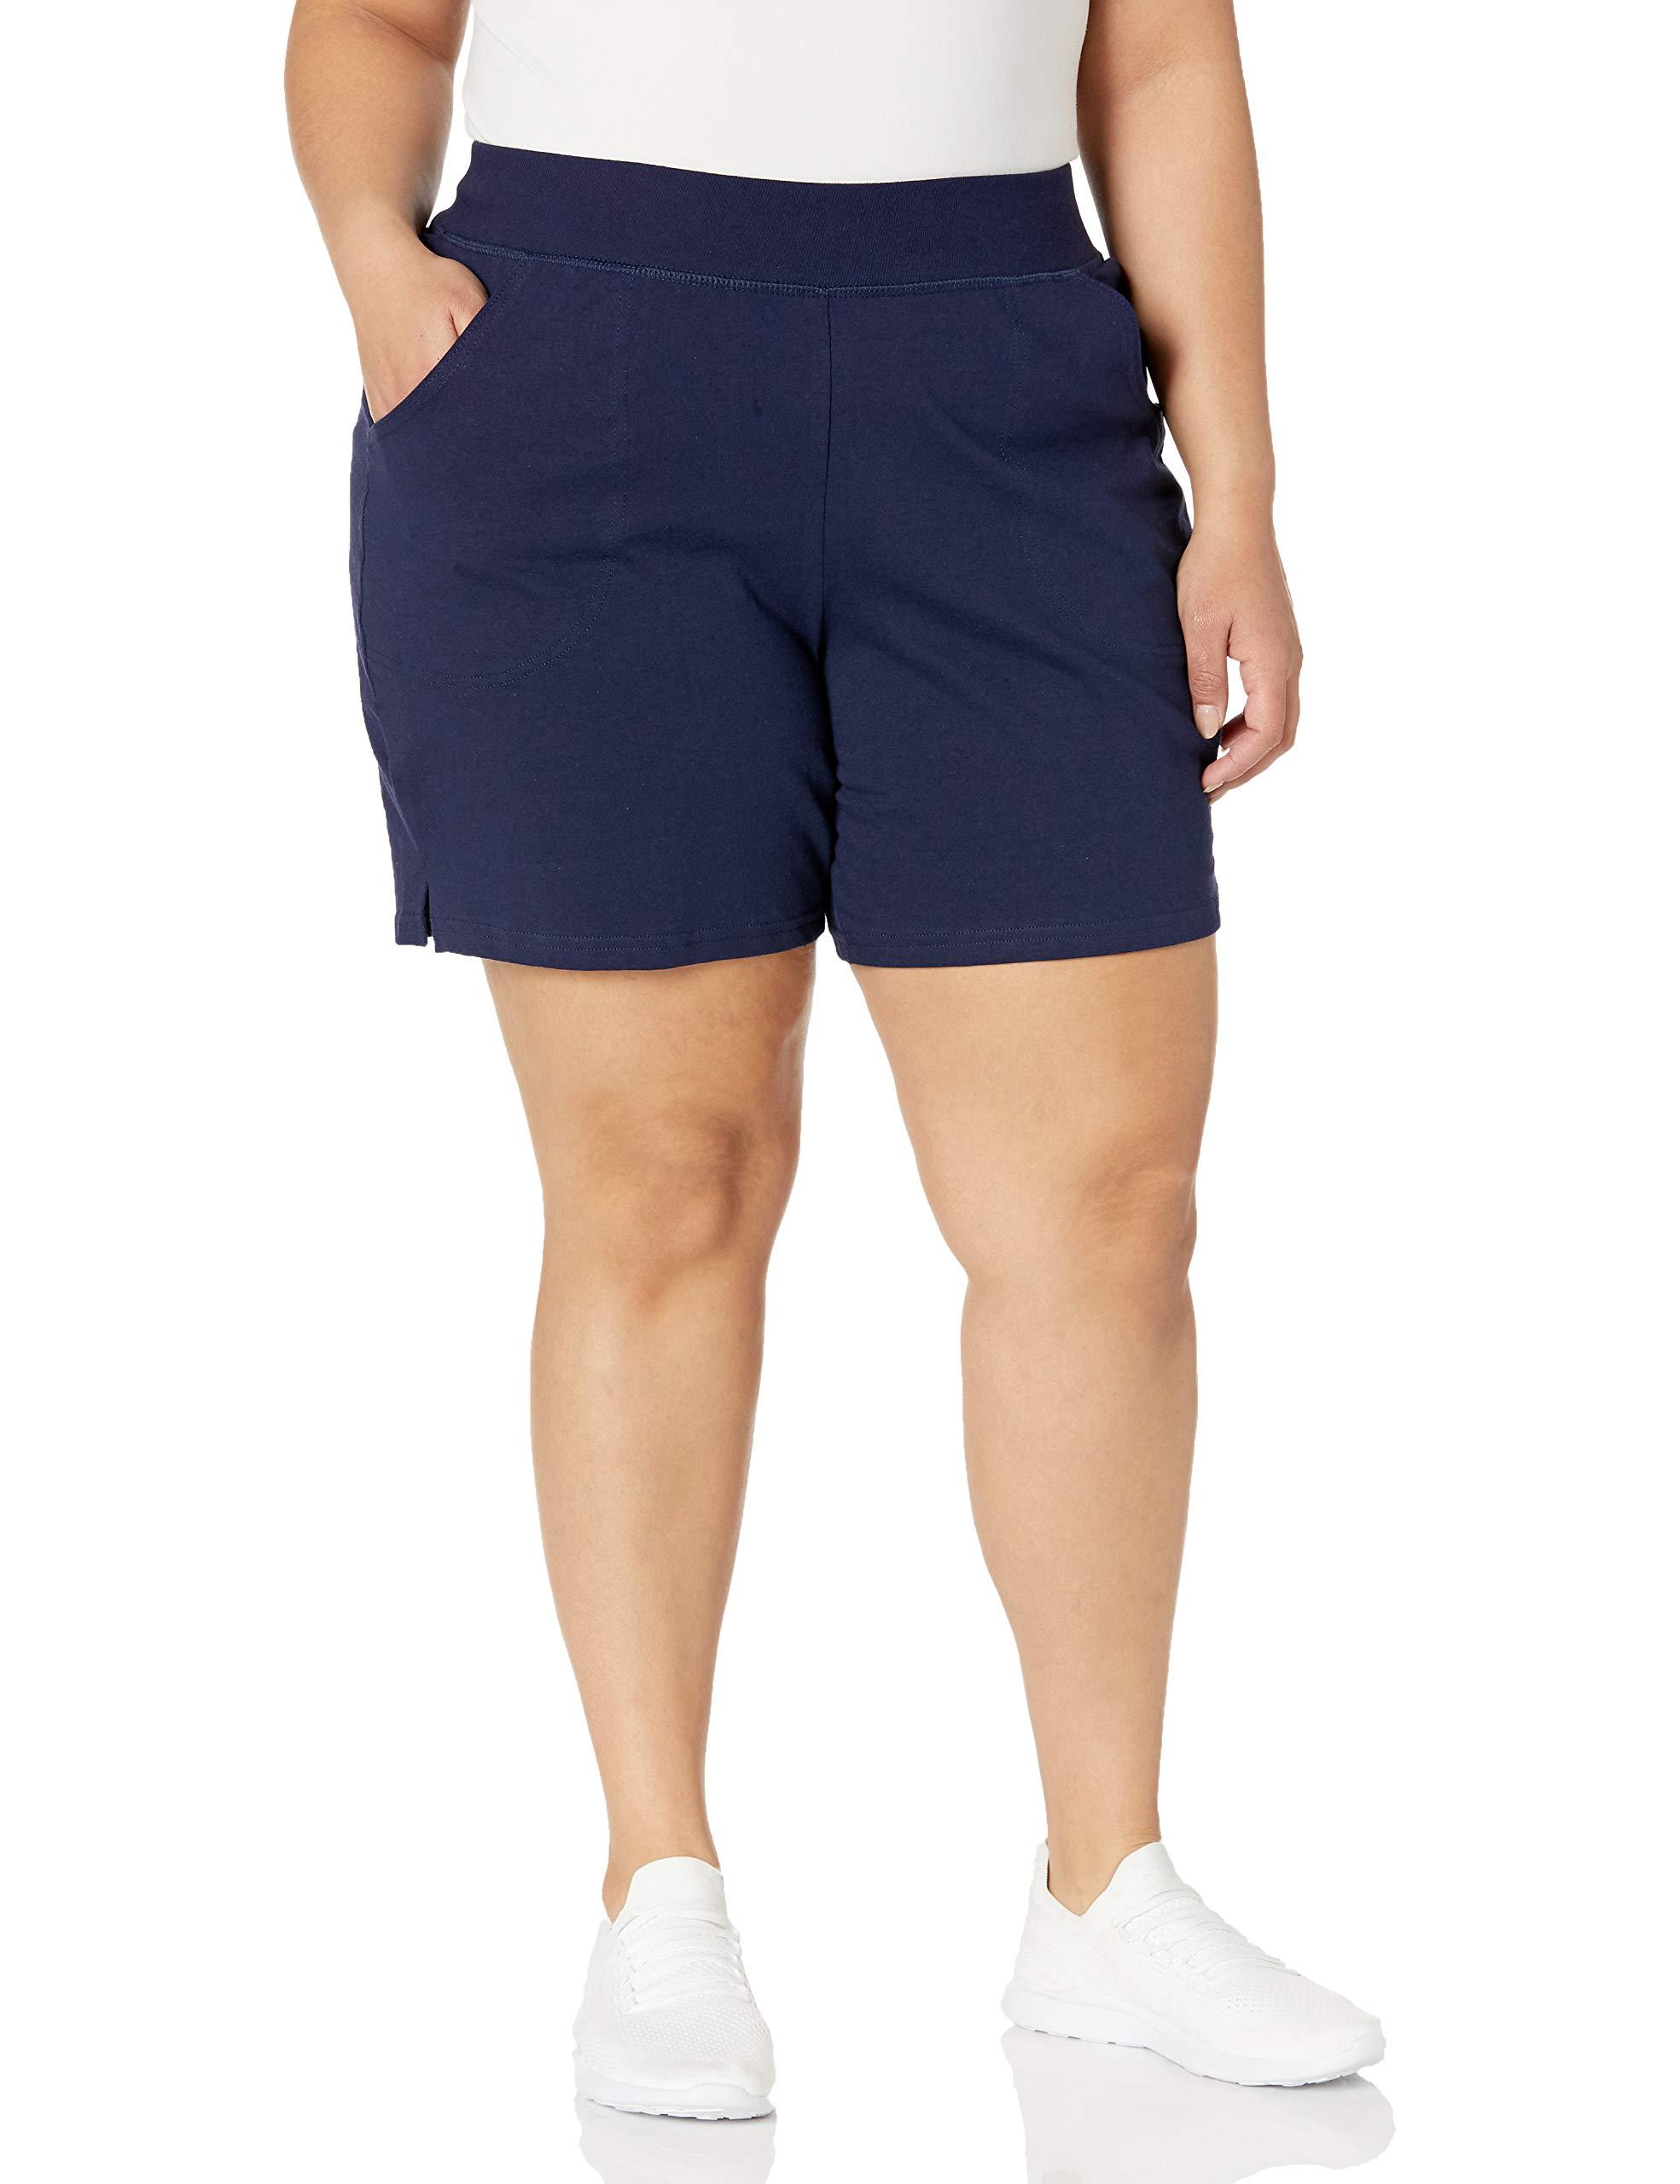 Women's Plus Cotton Jersey Pull-On Shorts